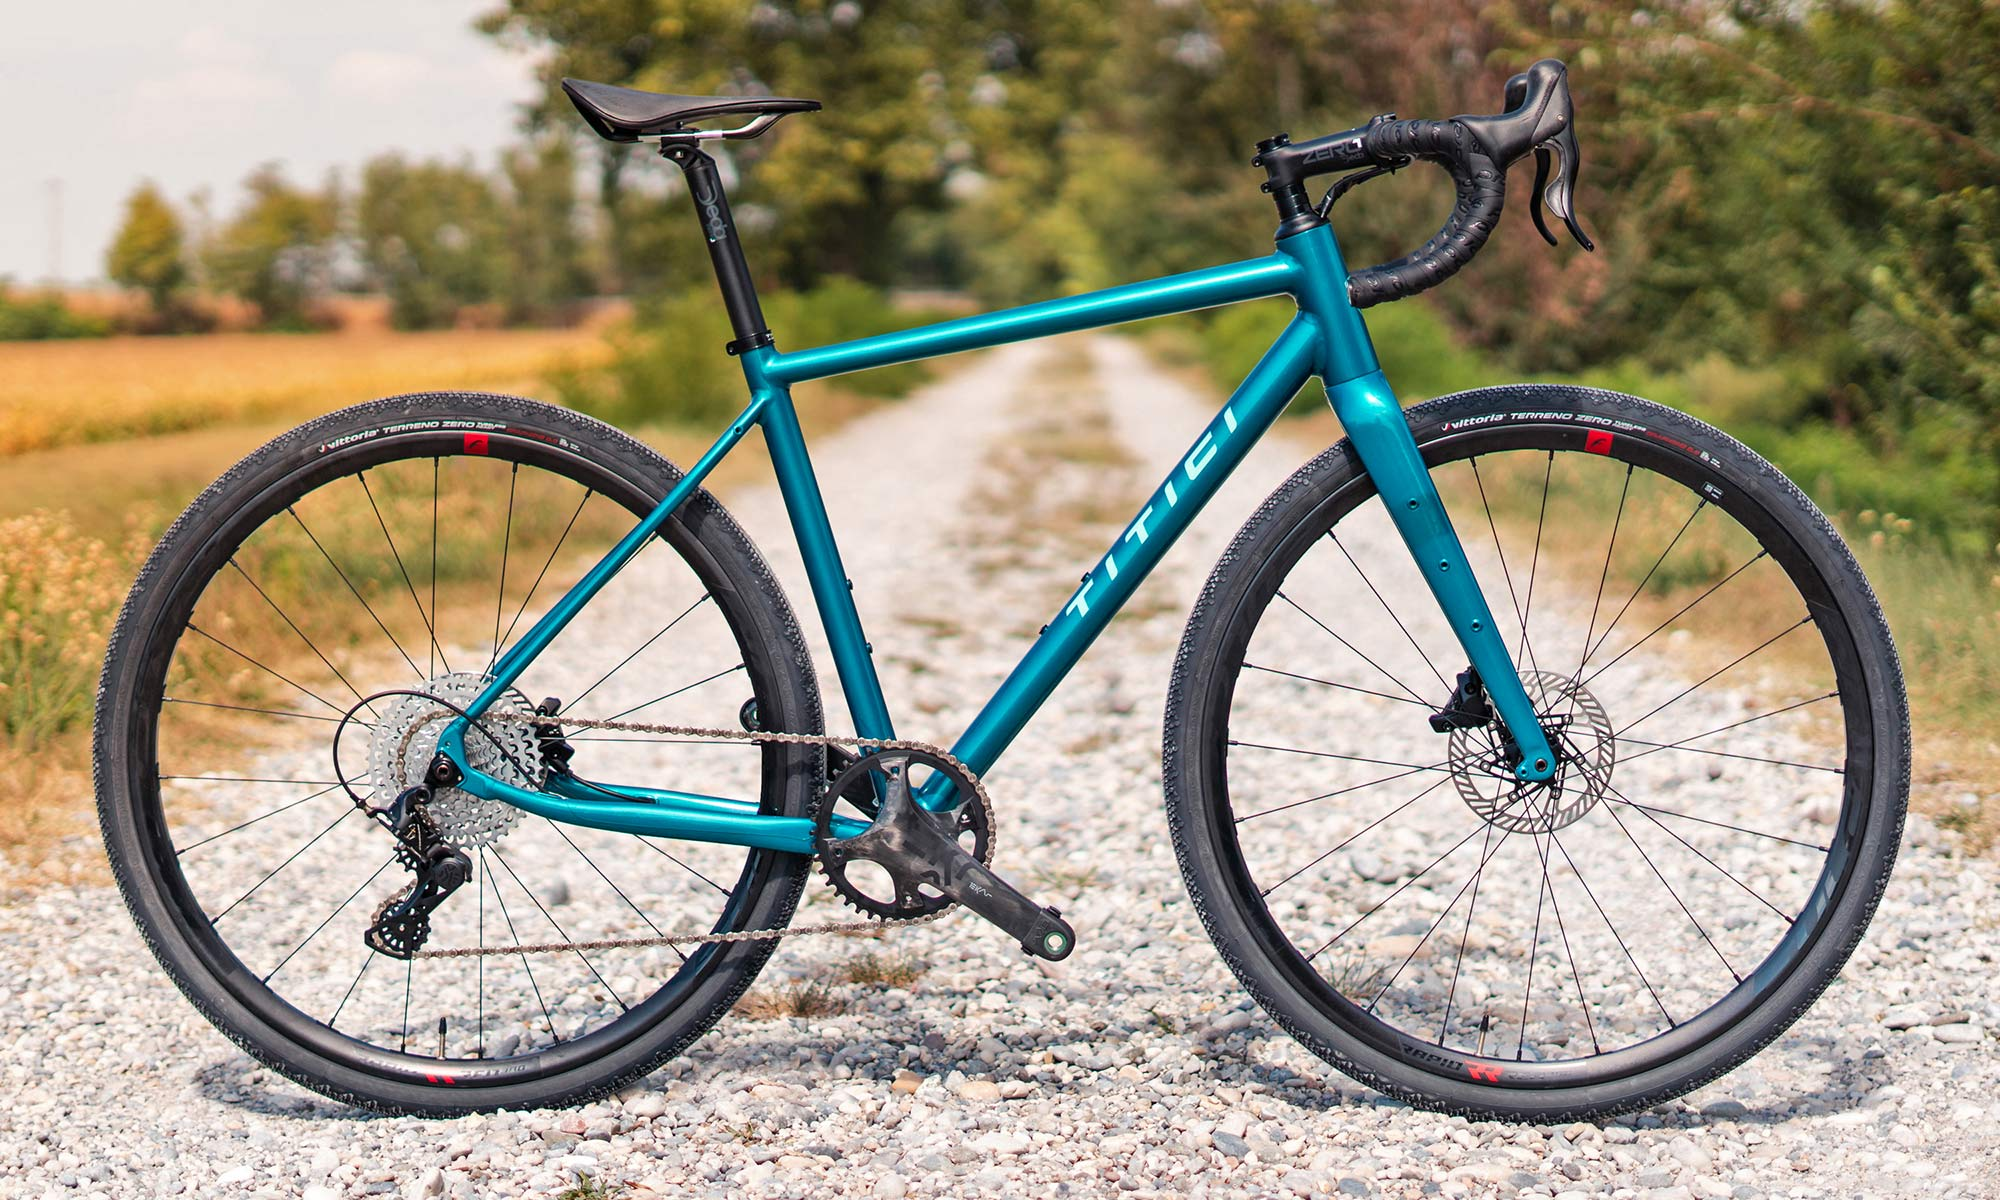 Titici All-In aluminum gravel bike, integrated custom alloy bike made-in-Italy, photo by Mattia Ragni,complete